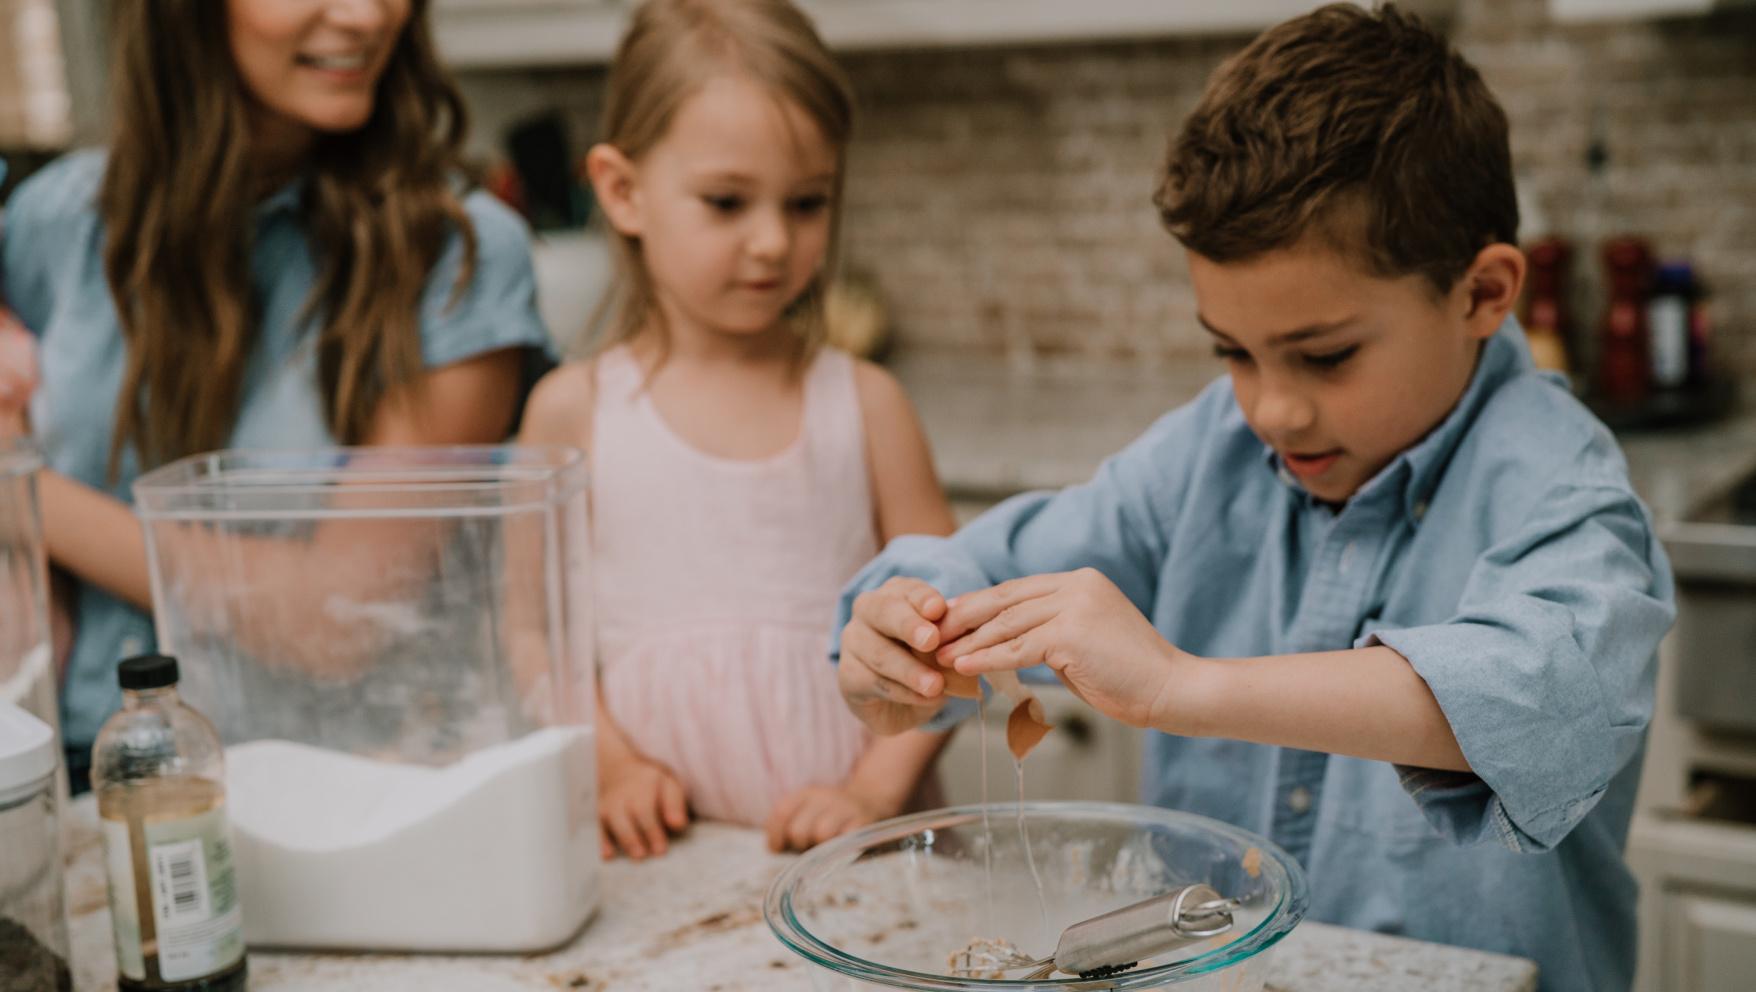 3 Ideas for Fun, Faith-Filled Family Nights